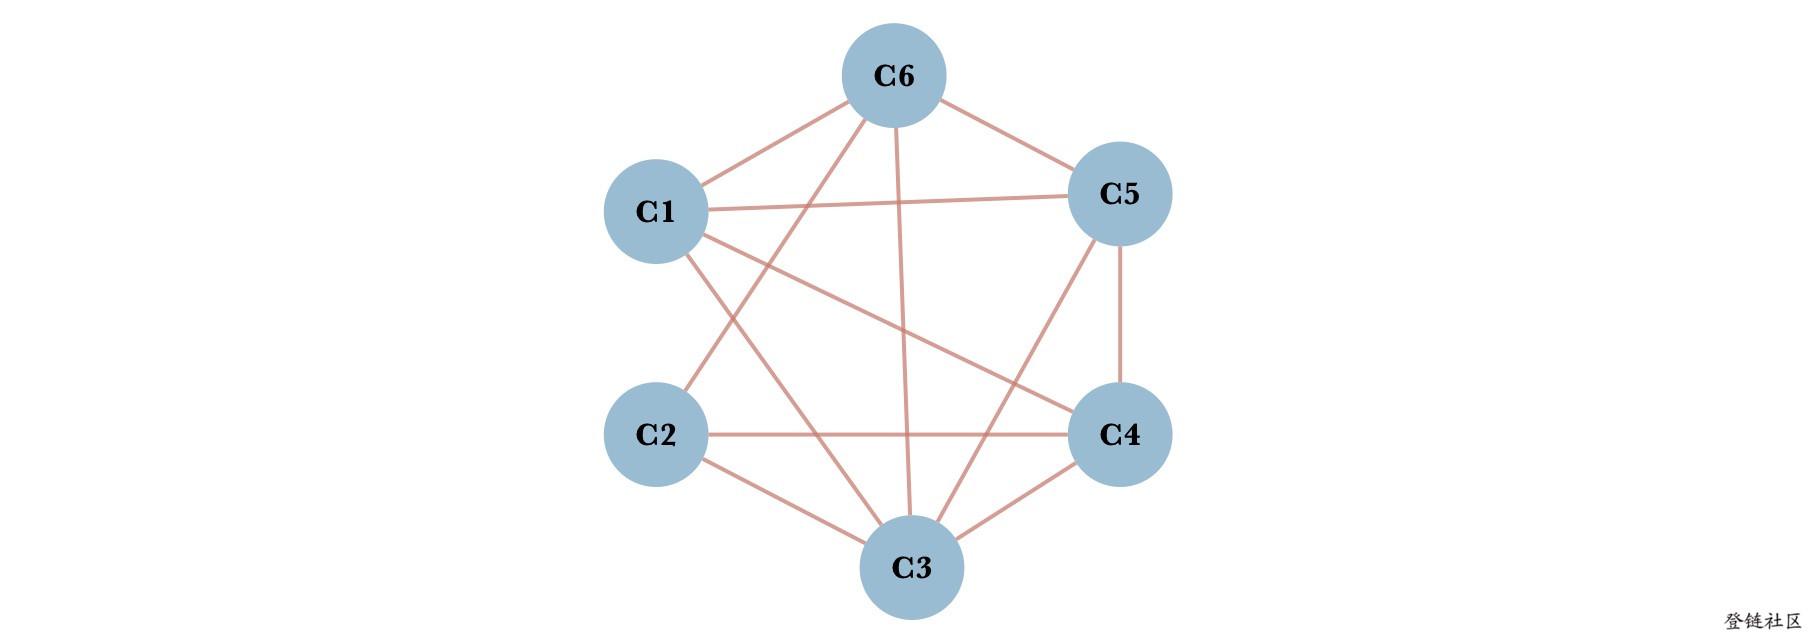 p2p网络模型